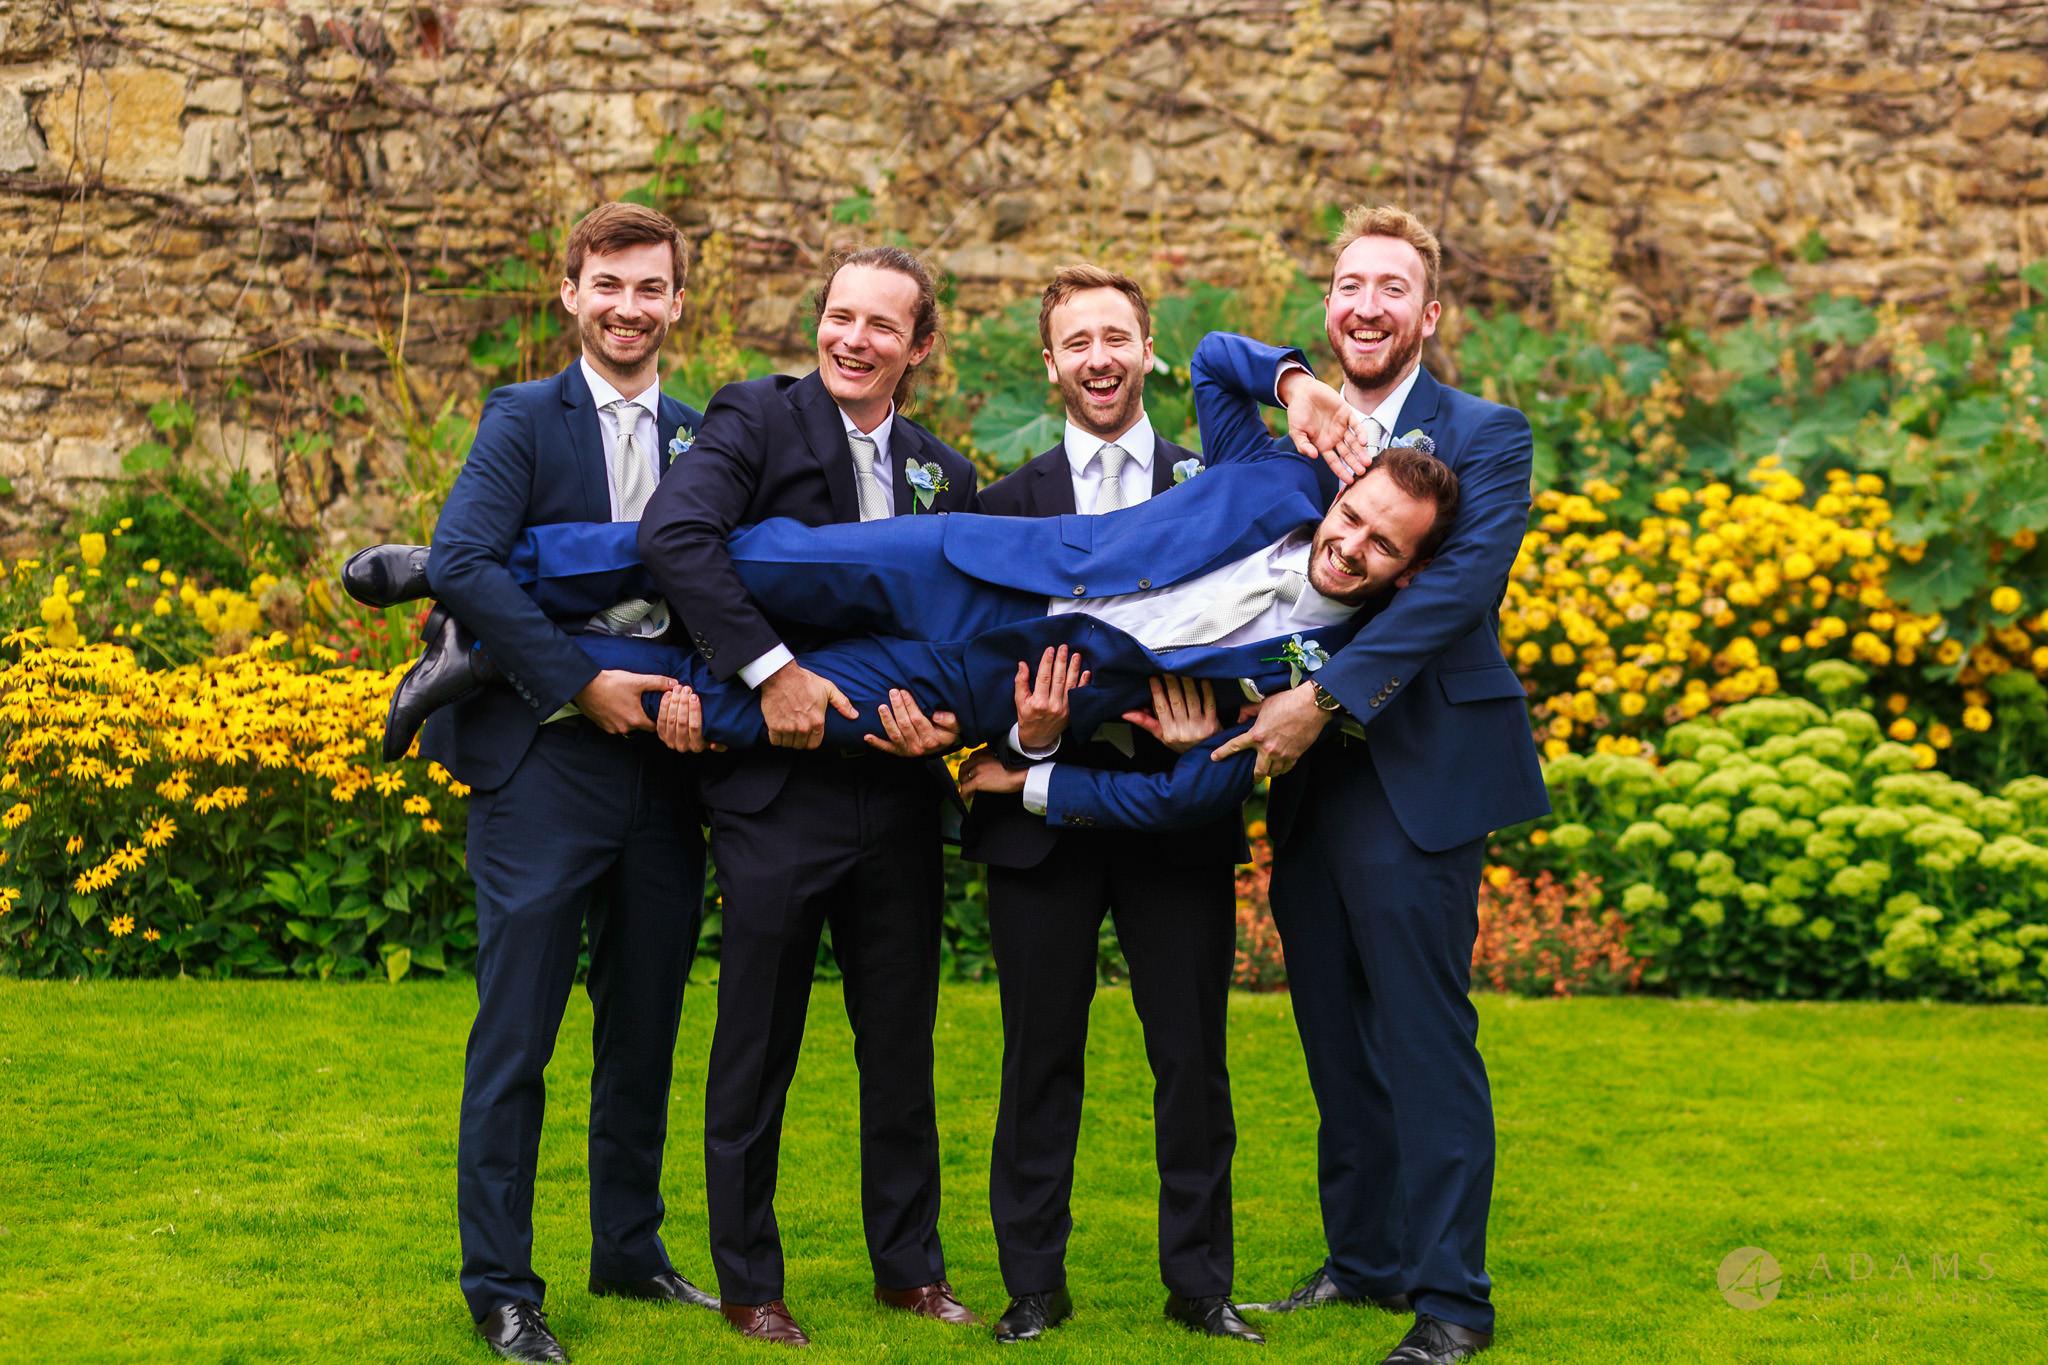 groomsmen hold the groom